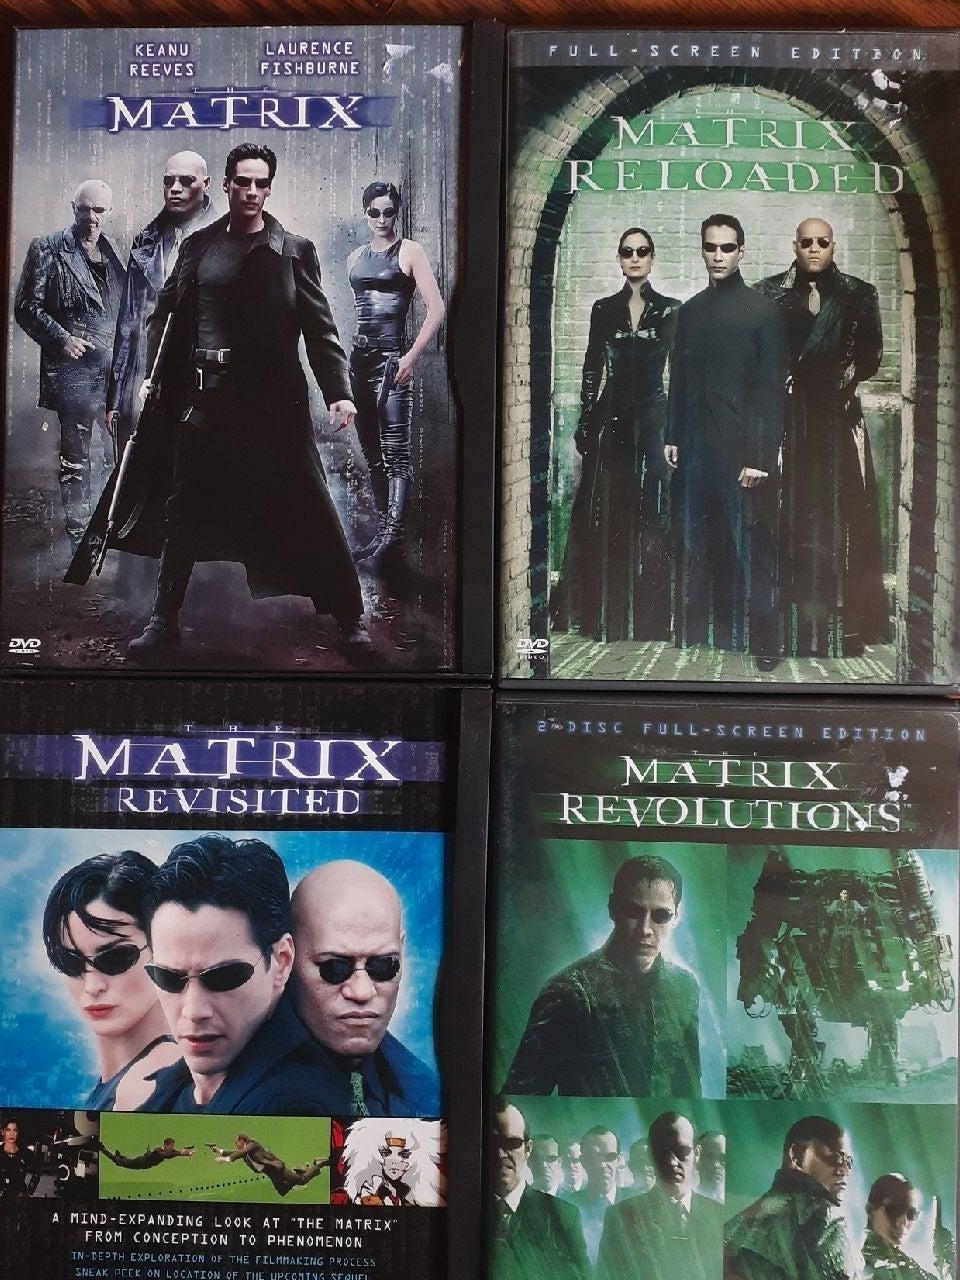 The complete Matrix DVD set